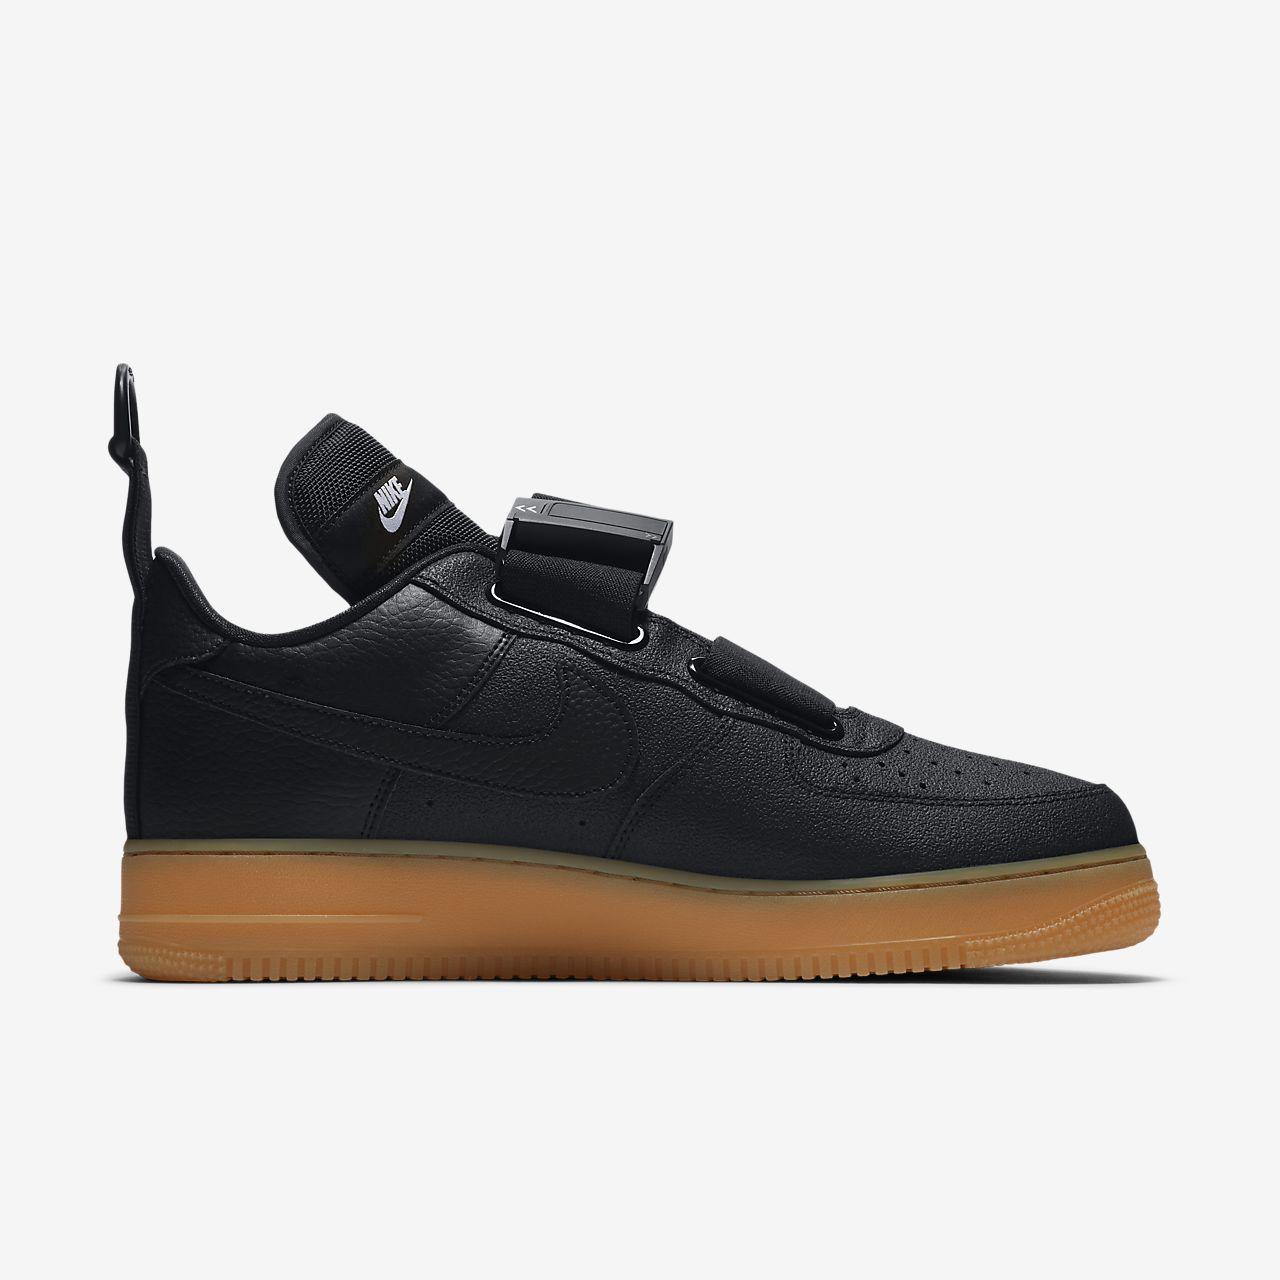 95c76c40c9ebdc Low Resolution Nike Air Force 1 Utility Men s Shoe Nike Air Force 1 Utility  Men s Shoe